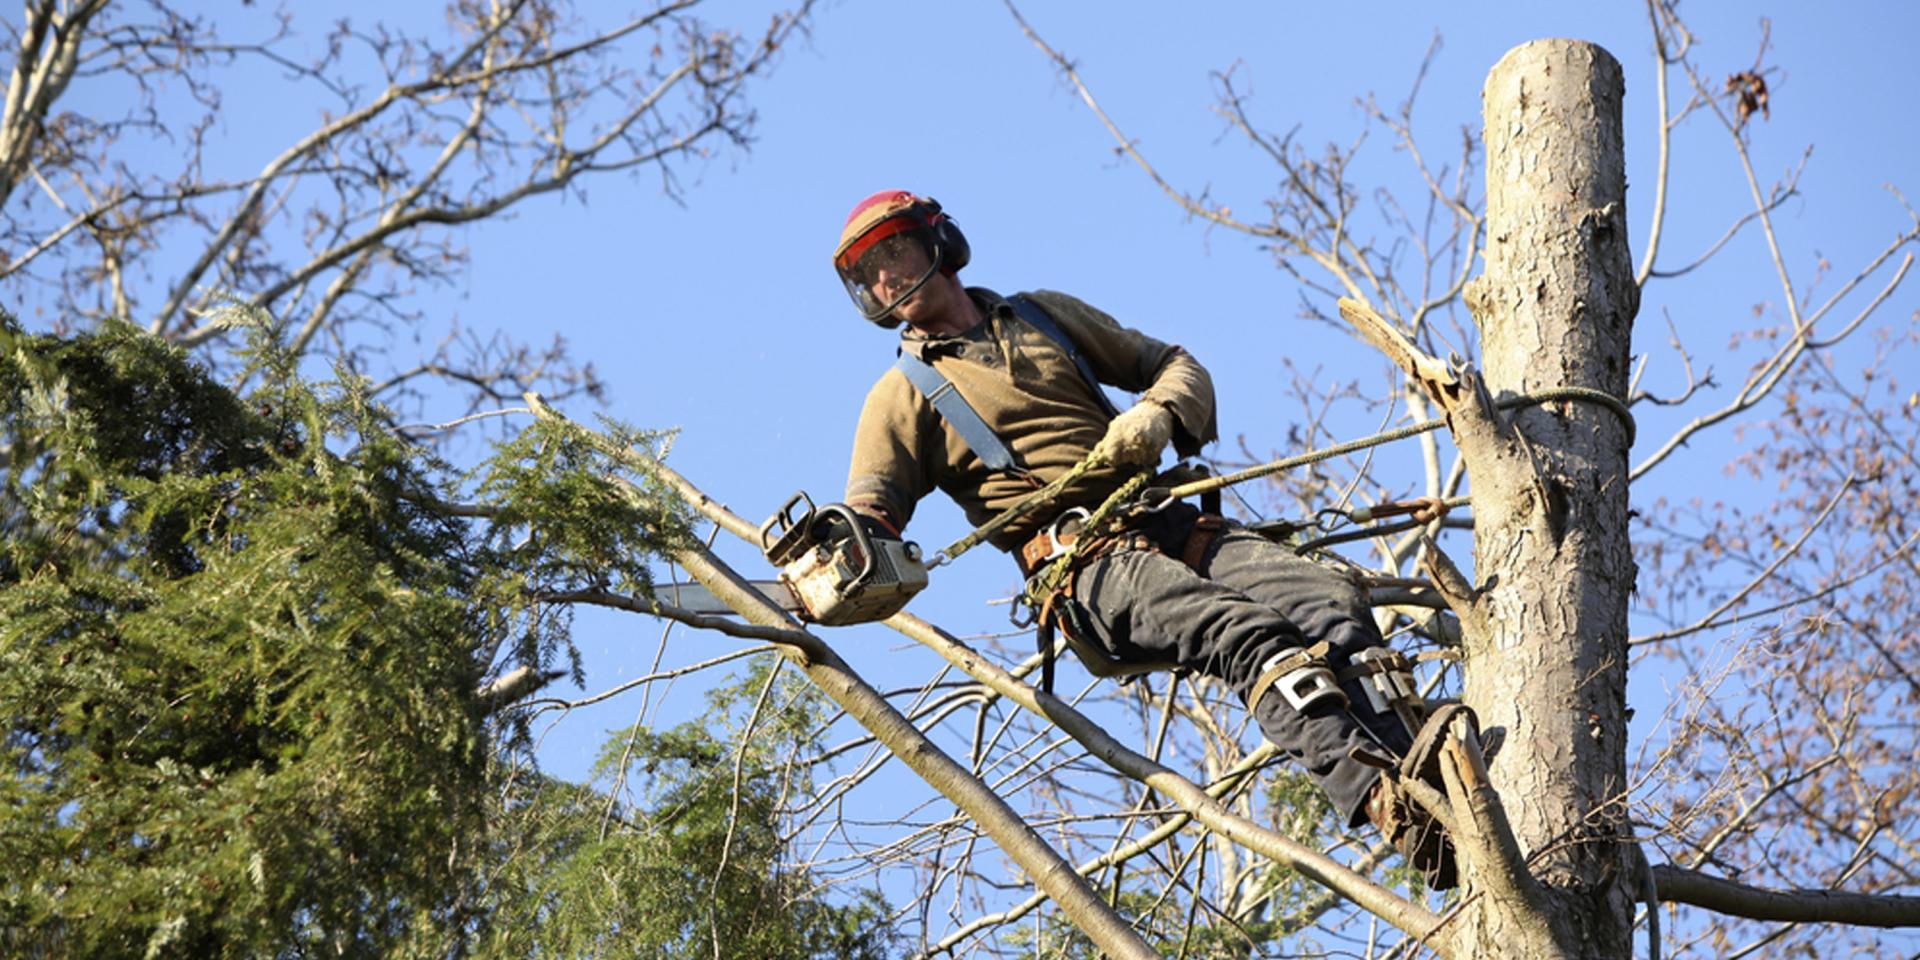 WOODSTOCK TREE & STUMP REMOVAL